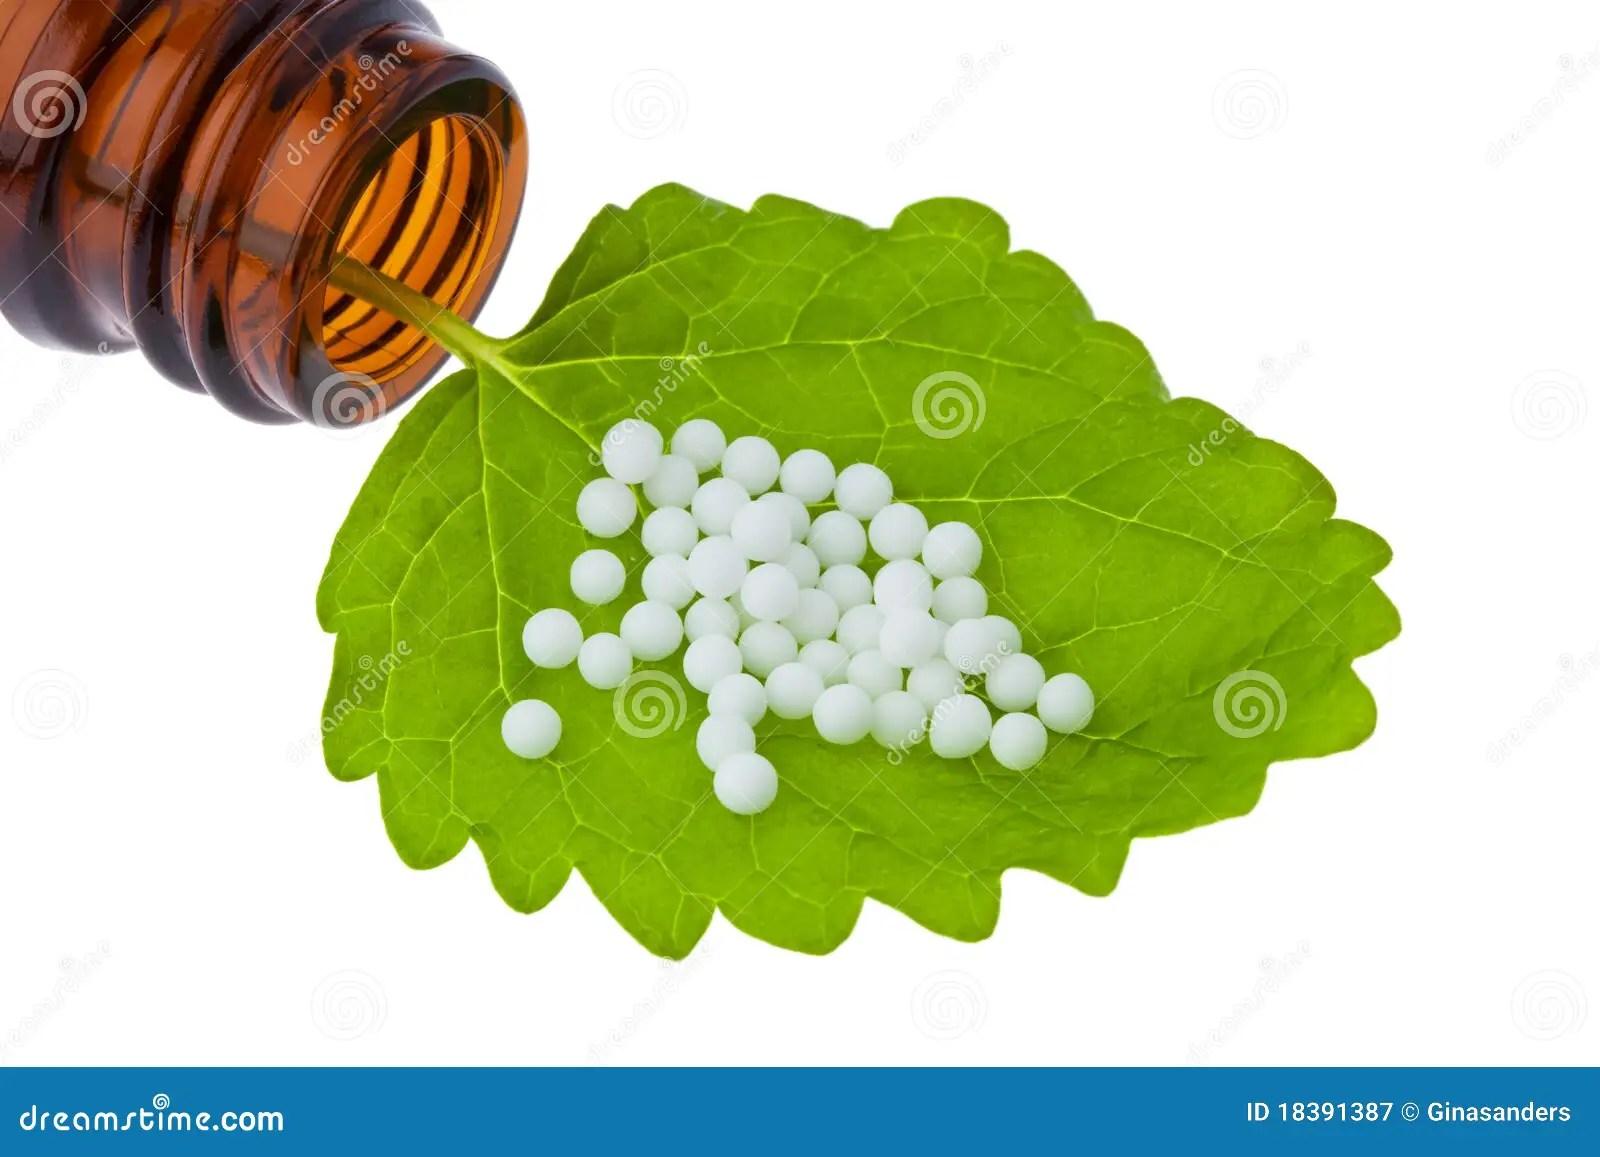 Homeopathy Globules As Alternative Medicine Royalty Free Stock Photography Image 18391387